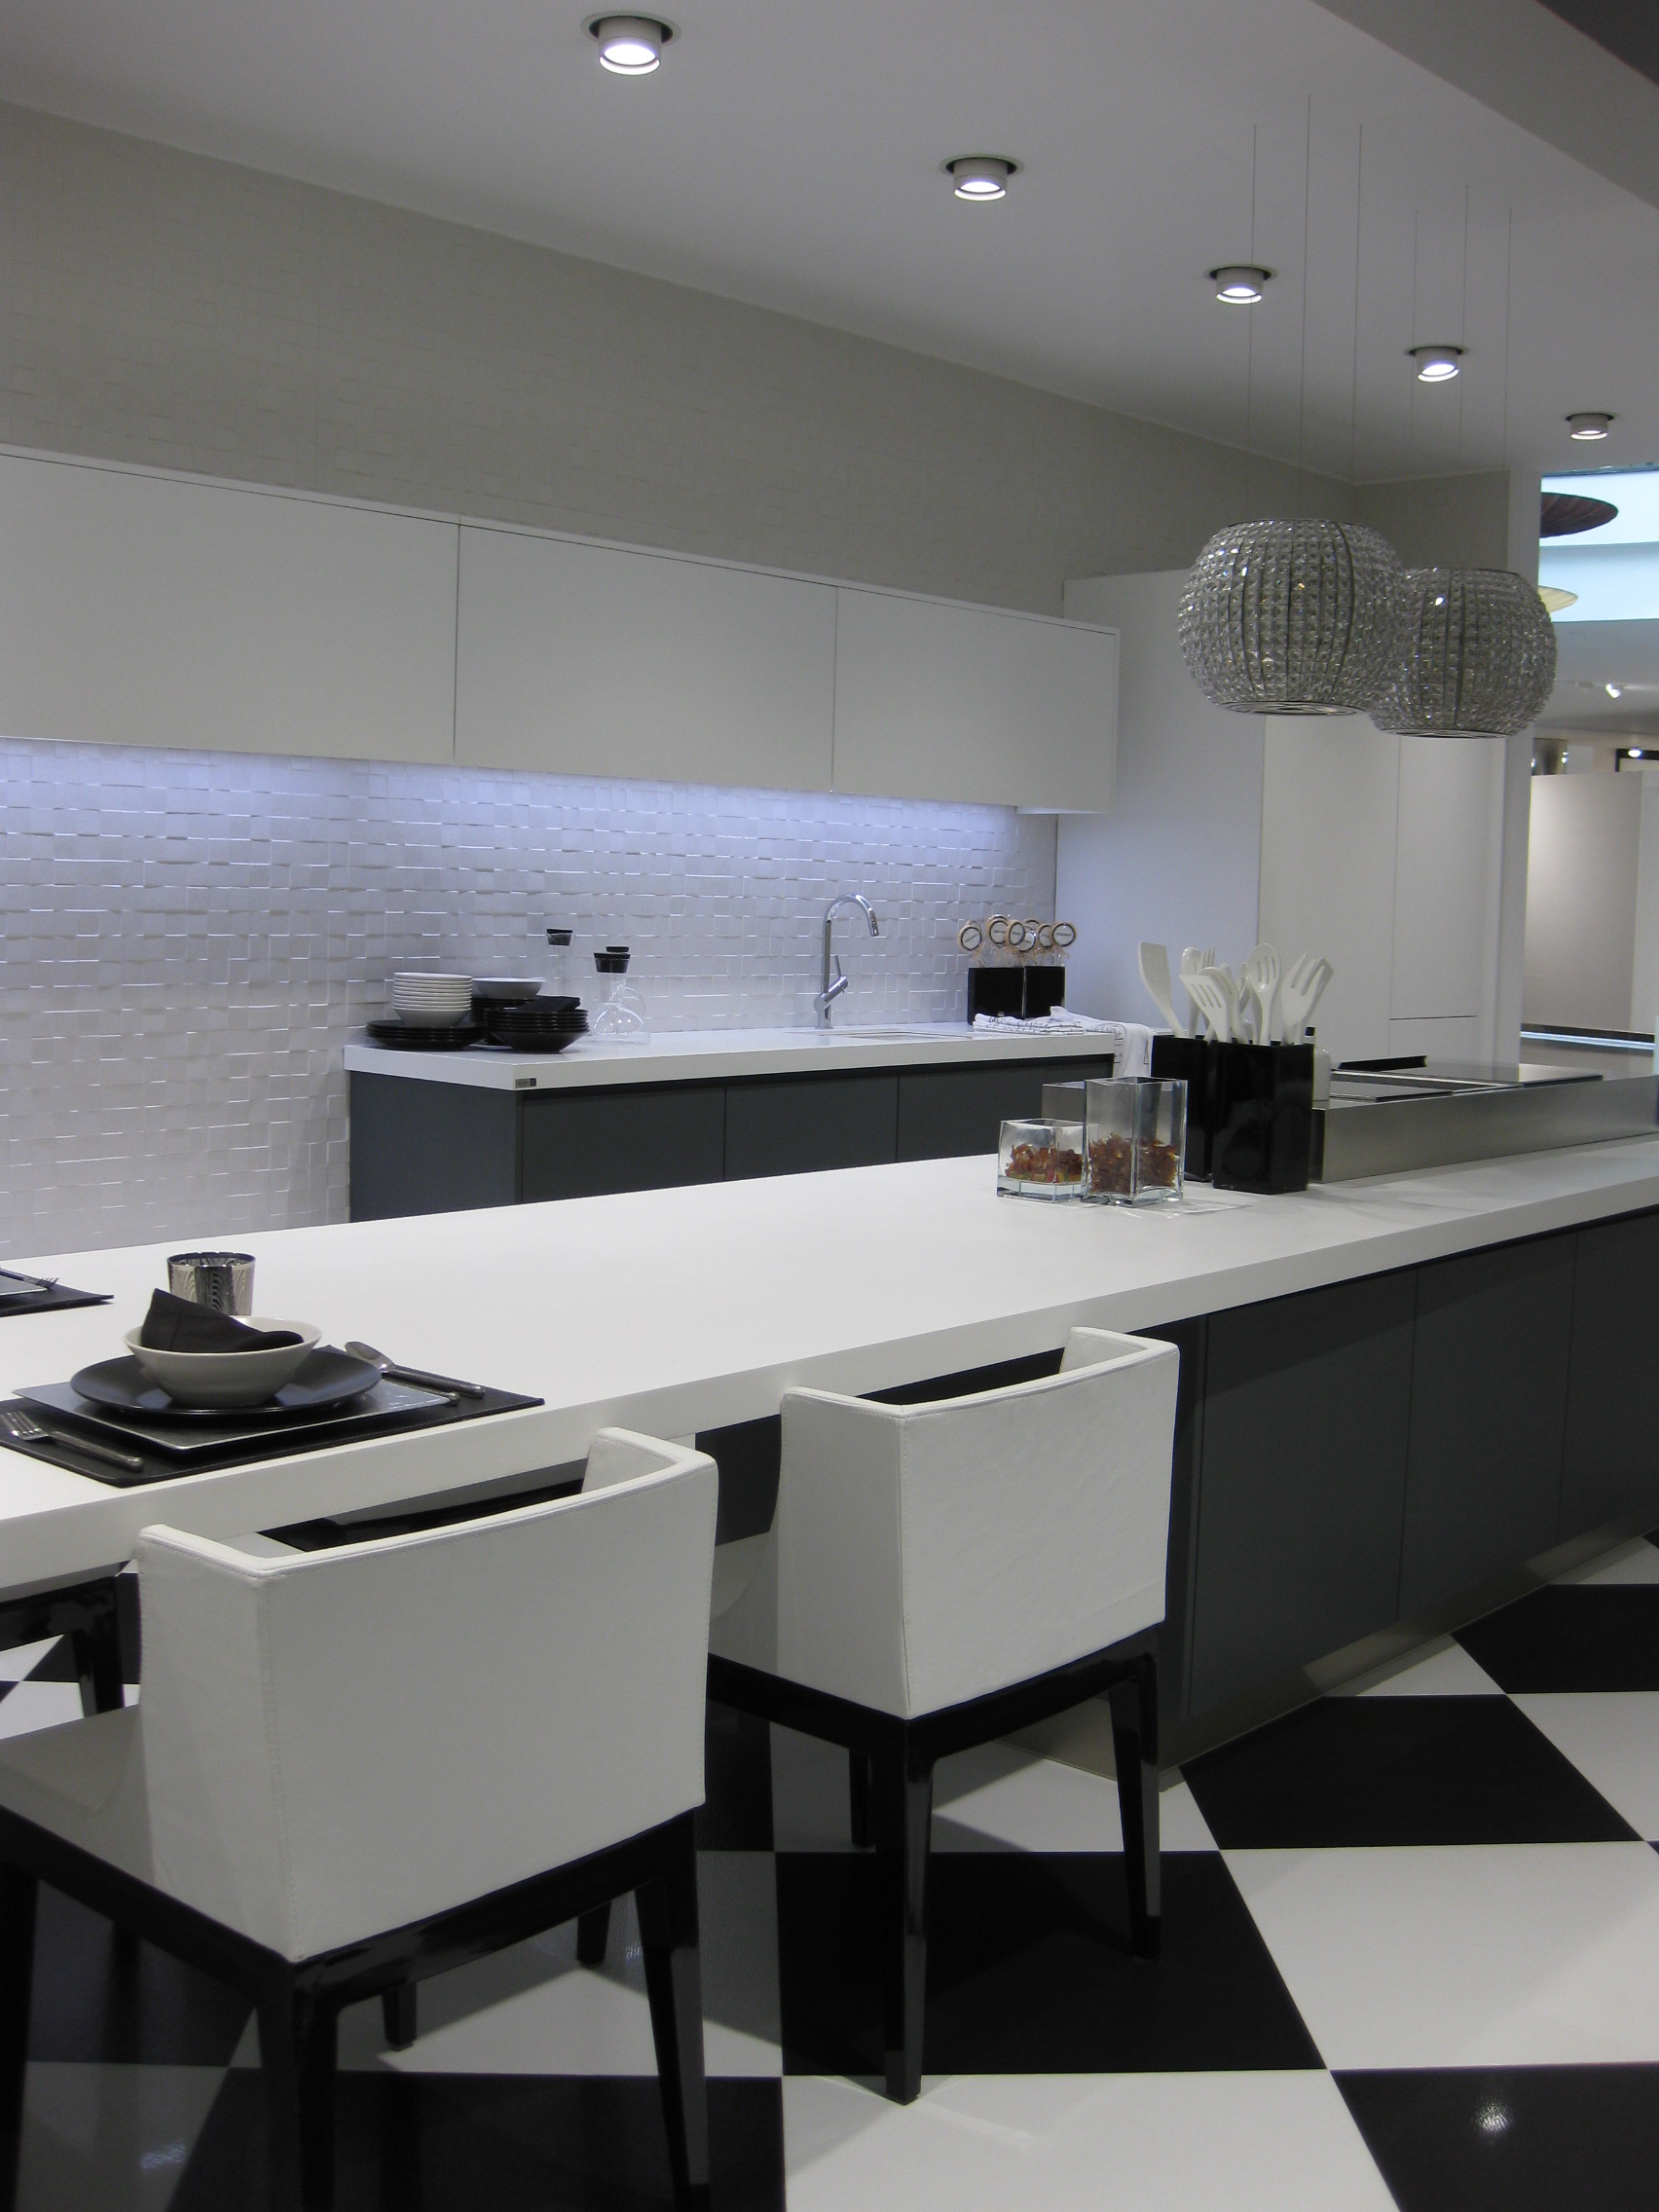 301 moved permanently - Cocinas de porcelanosa ...